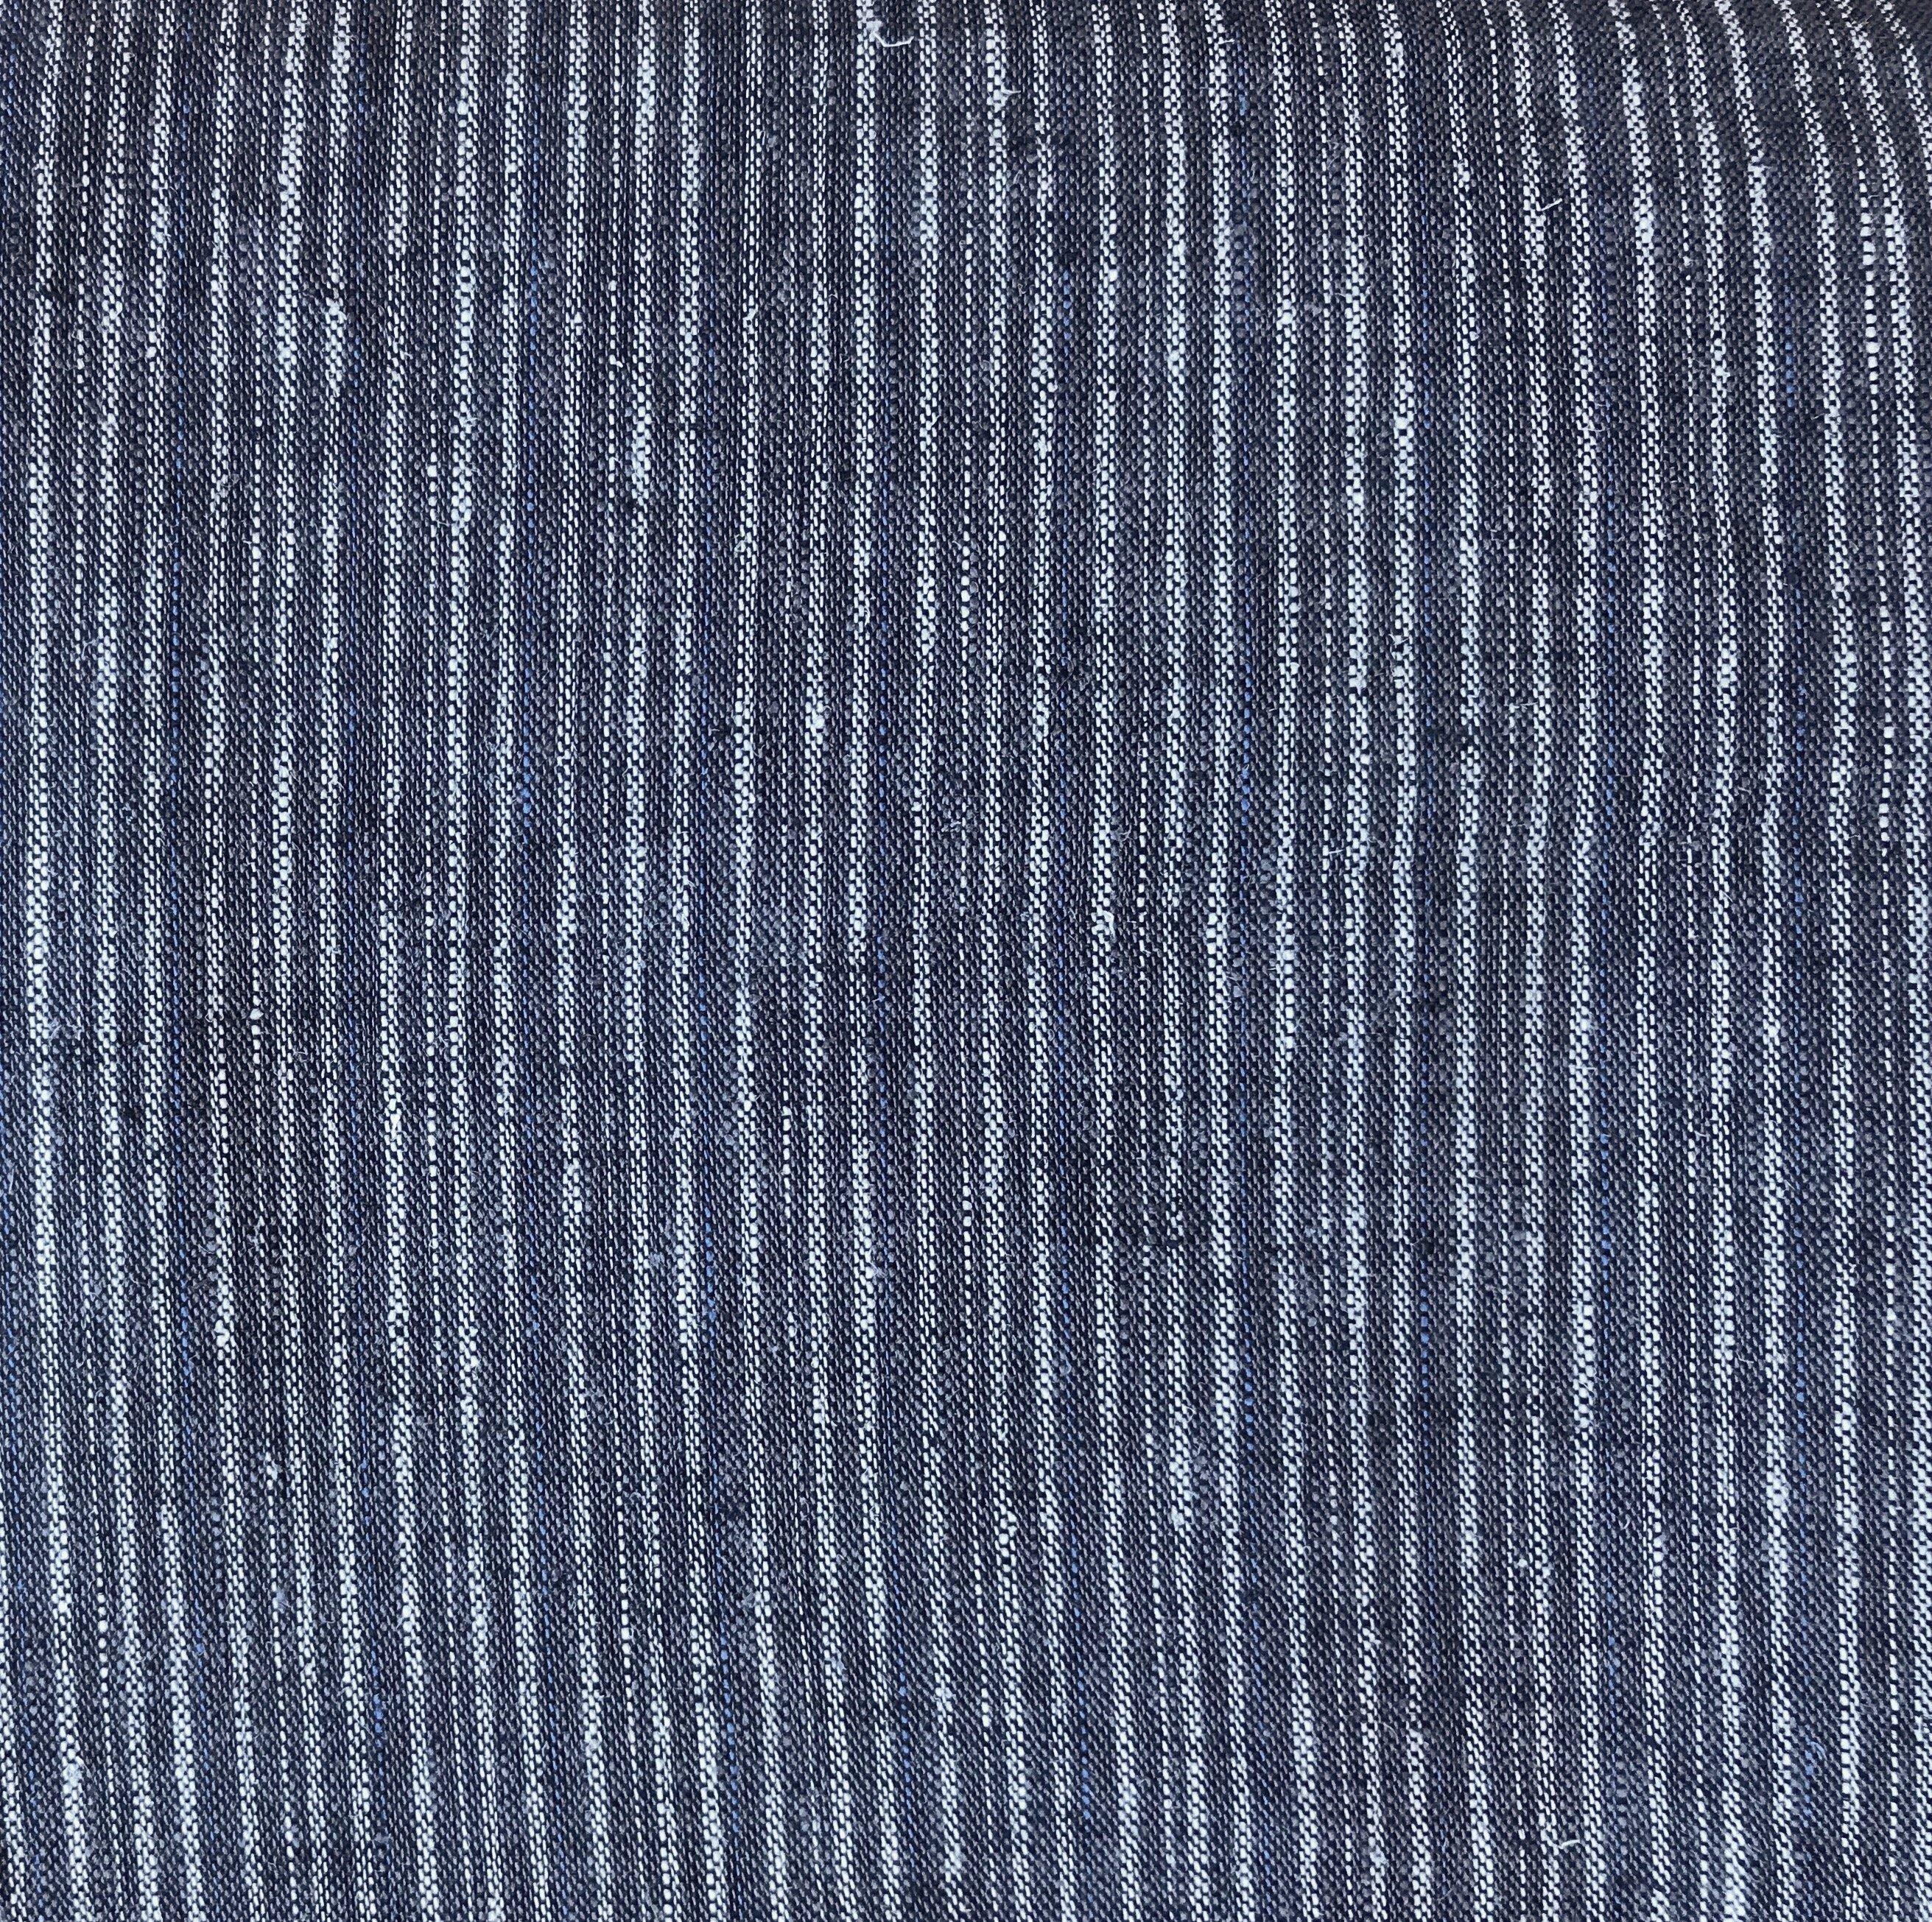 Navy Blue Hemp/Organic Cotton Ticking, HECT08